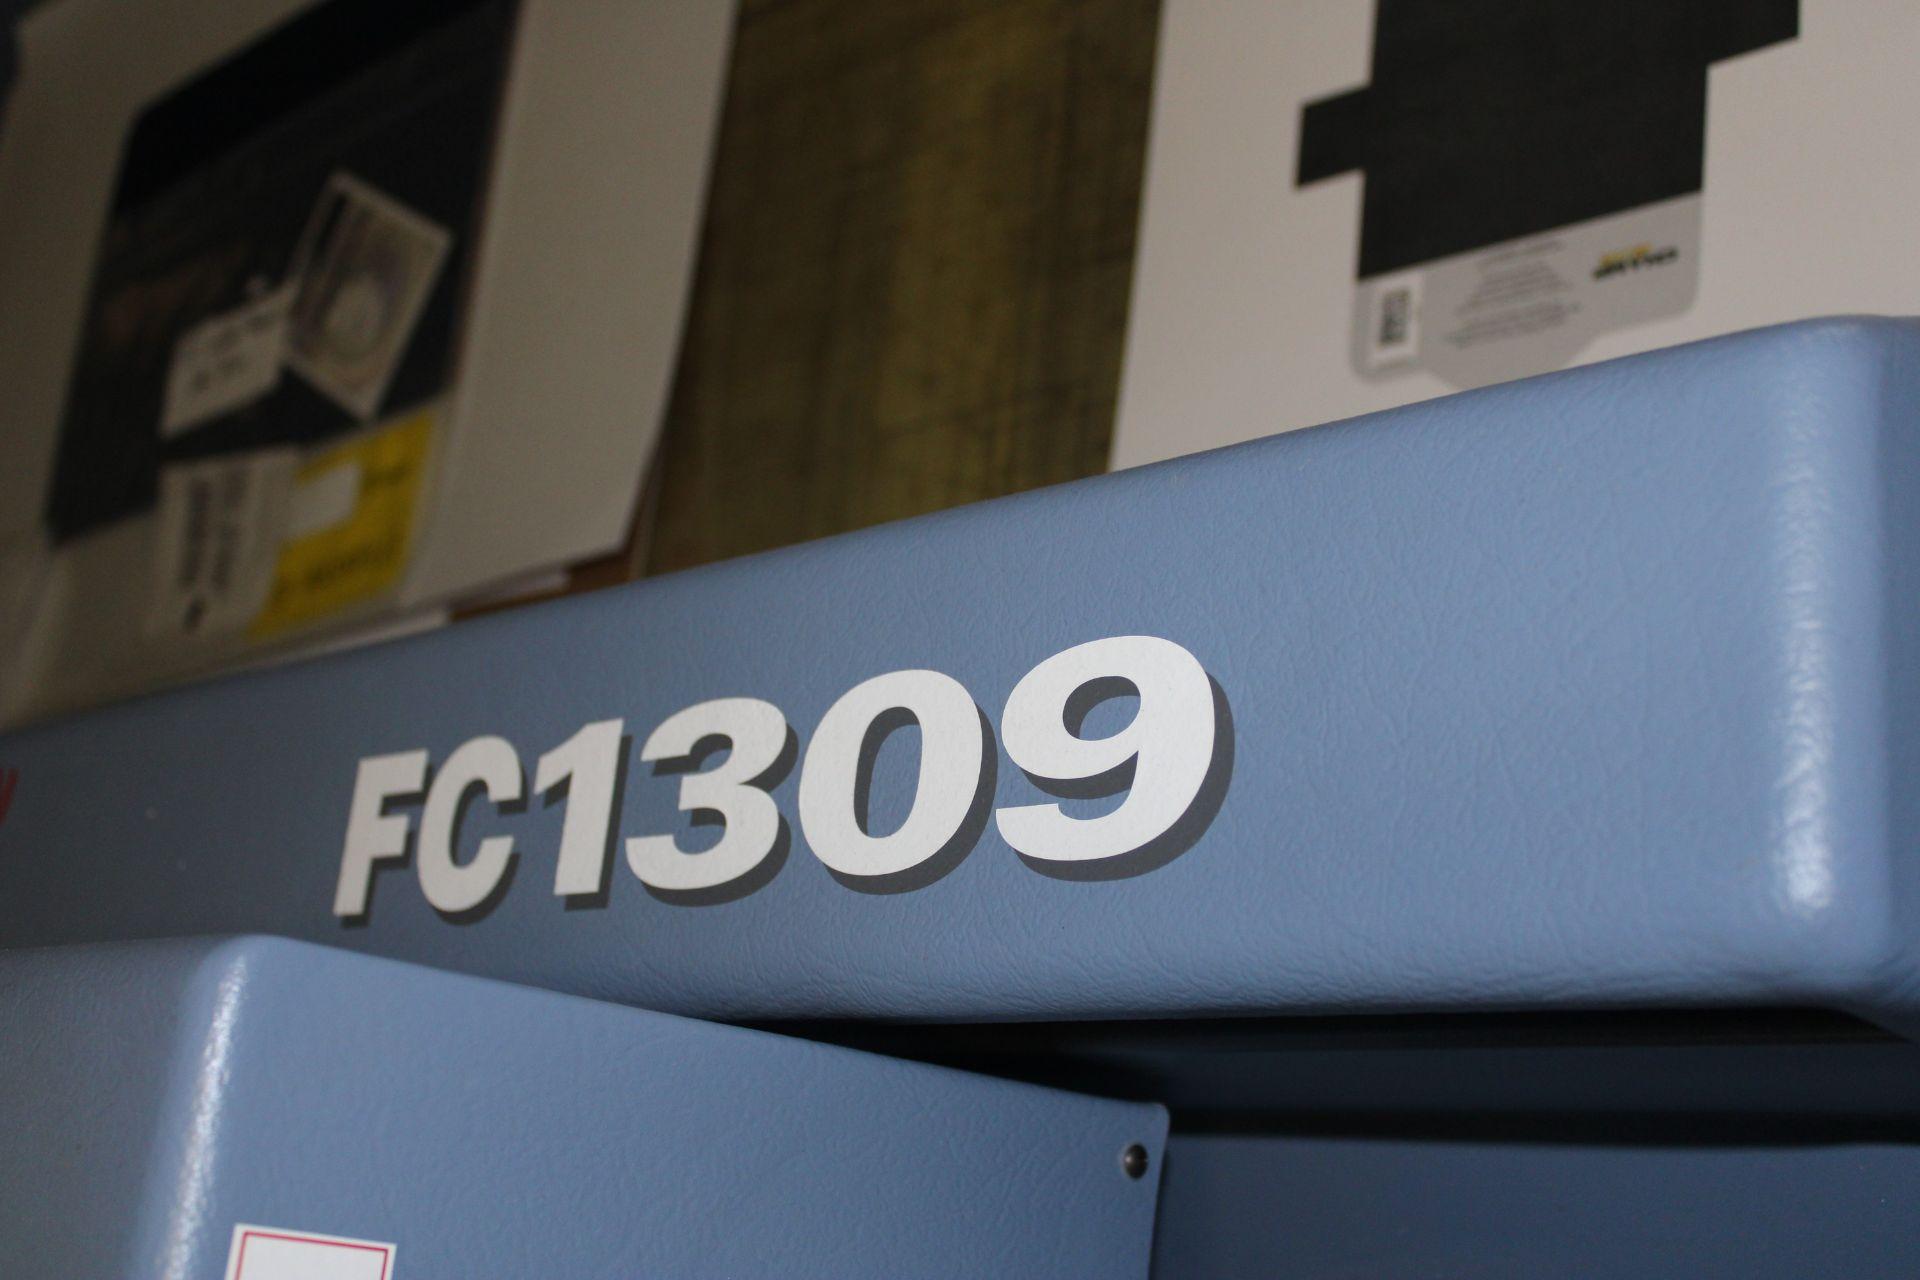 Lot 20 - Kongsberg Model FC1309 Folding Carton Plotter Includes a Dell Dimension Computer/Monitor/Keyboard/